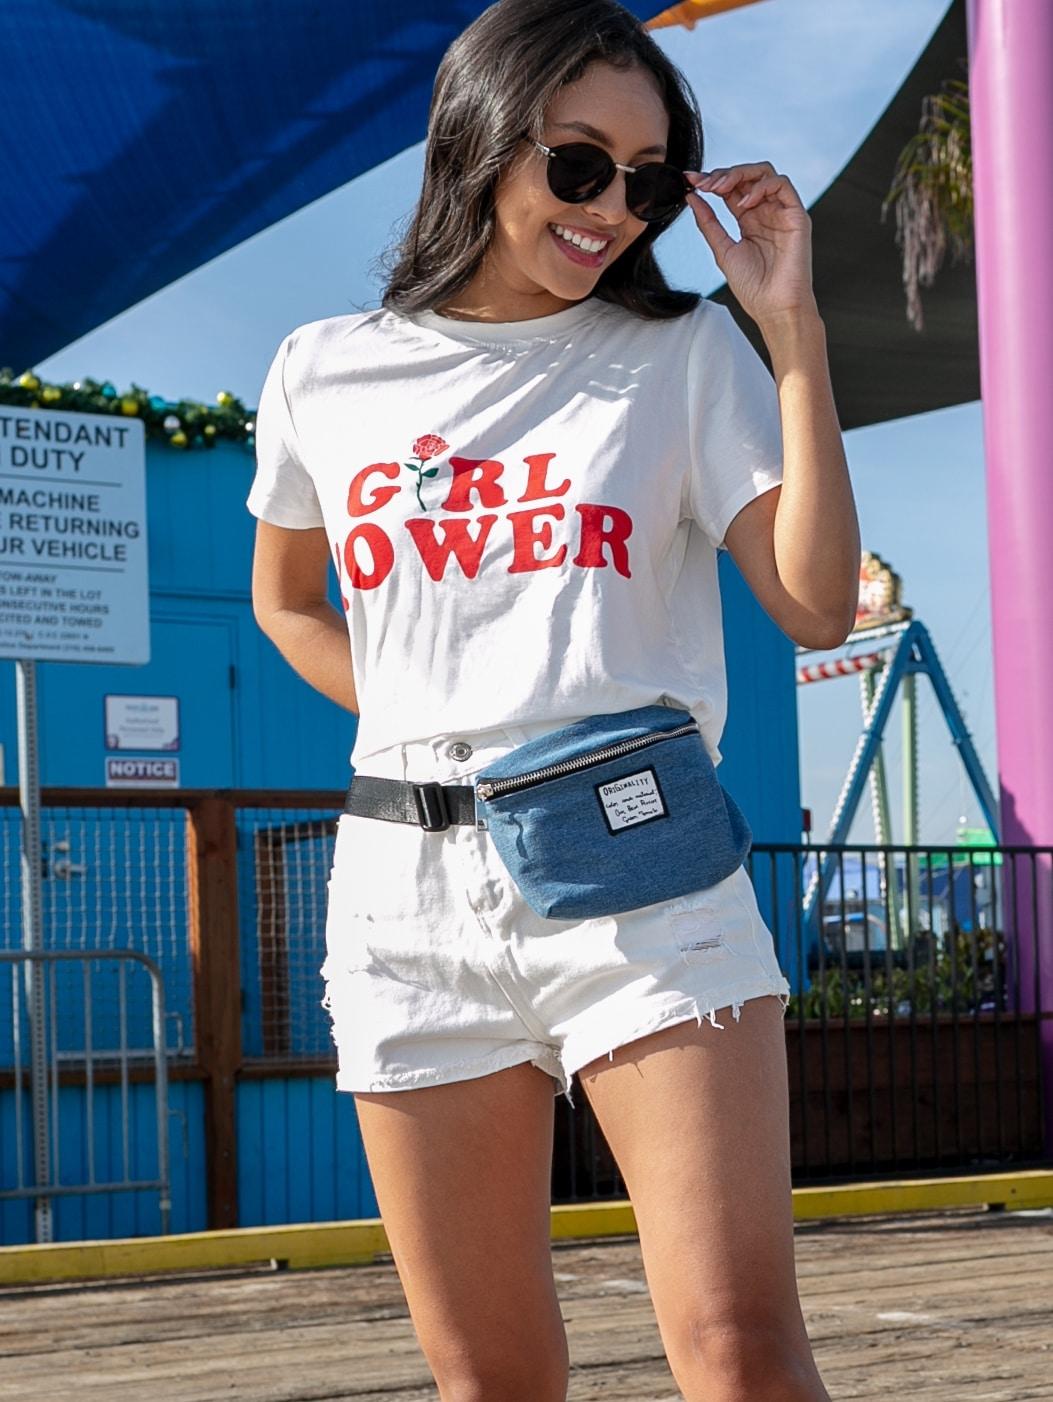 1 Plus1 Girls Slogan & Floral Print Tee by Romwe